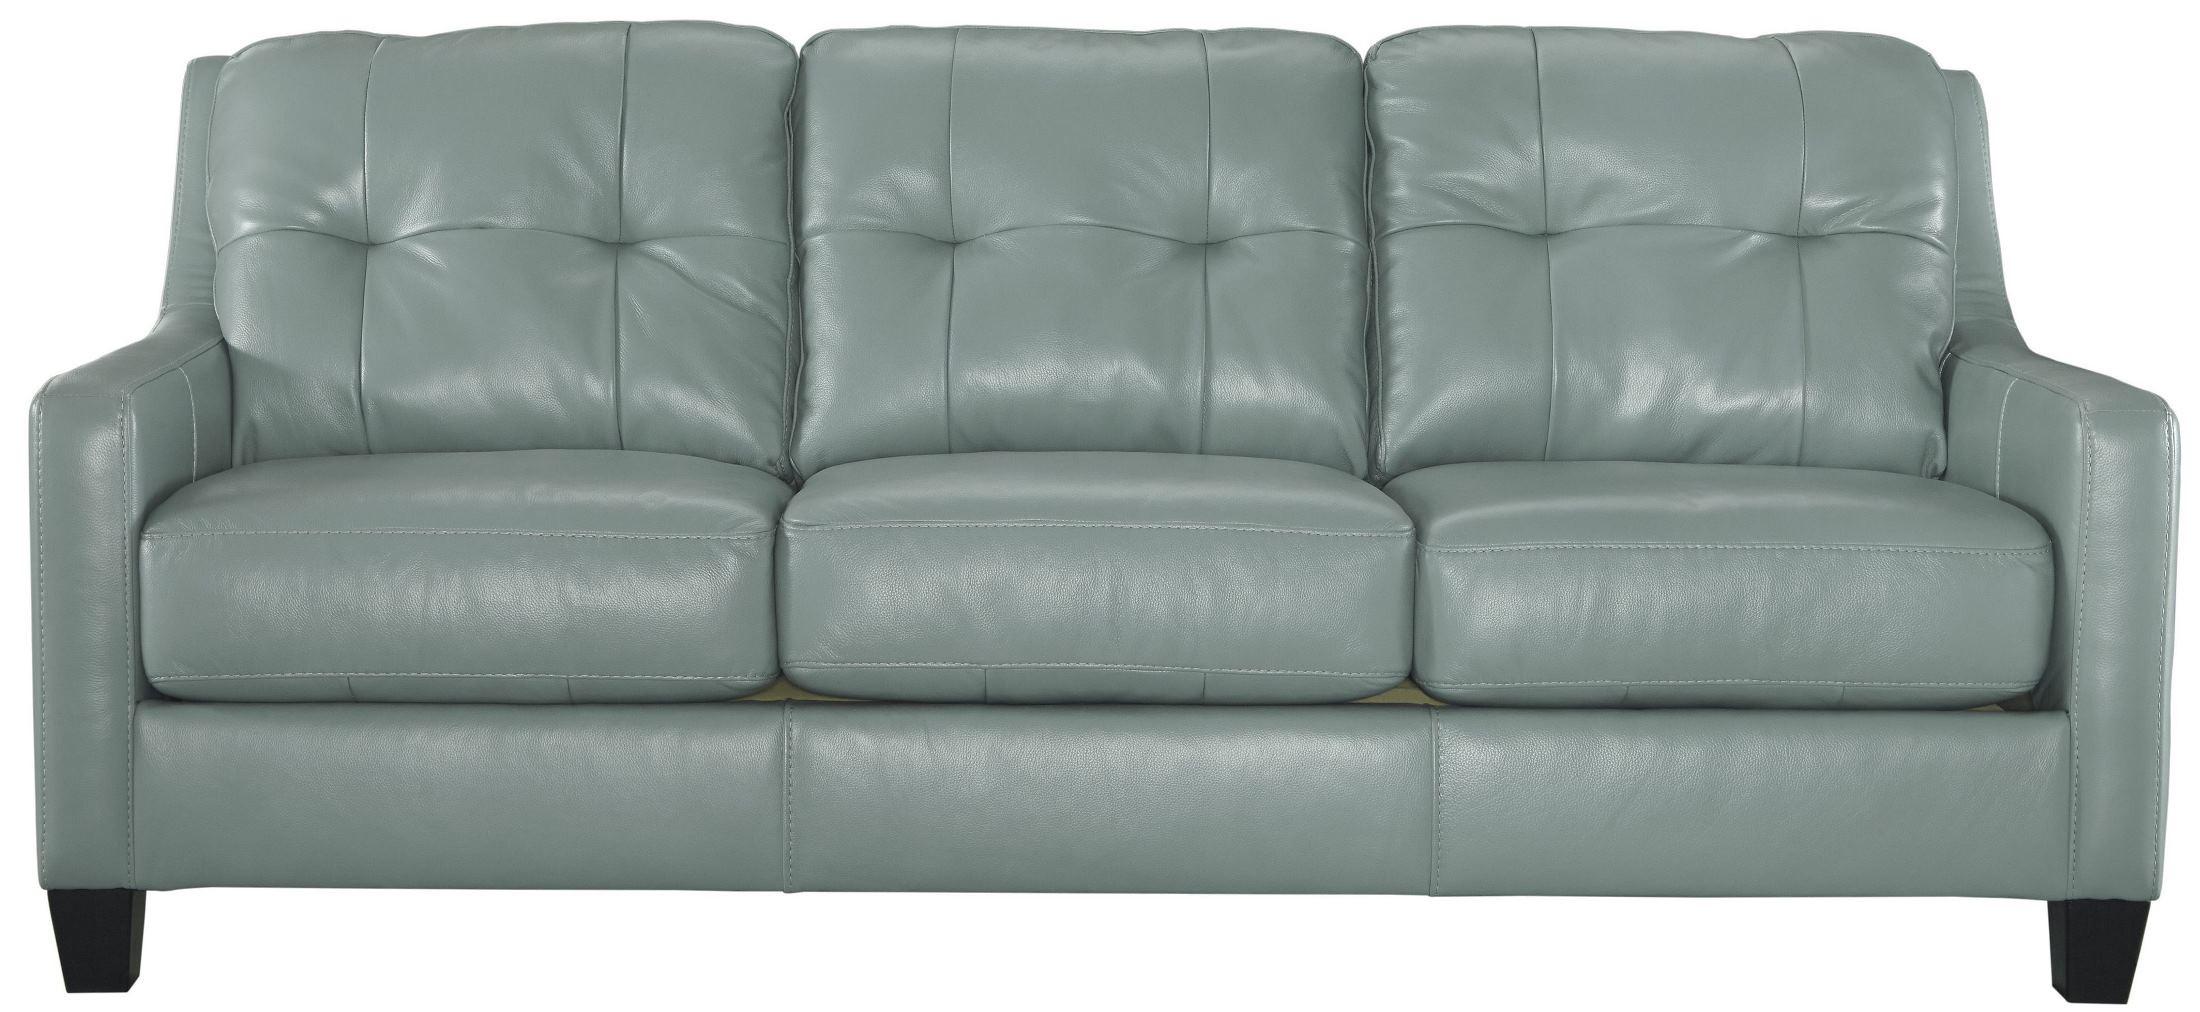 O Kean Sky Queen Sofa Sleeper 5910339 Ashley